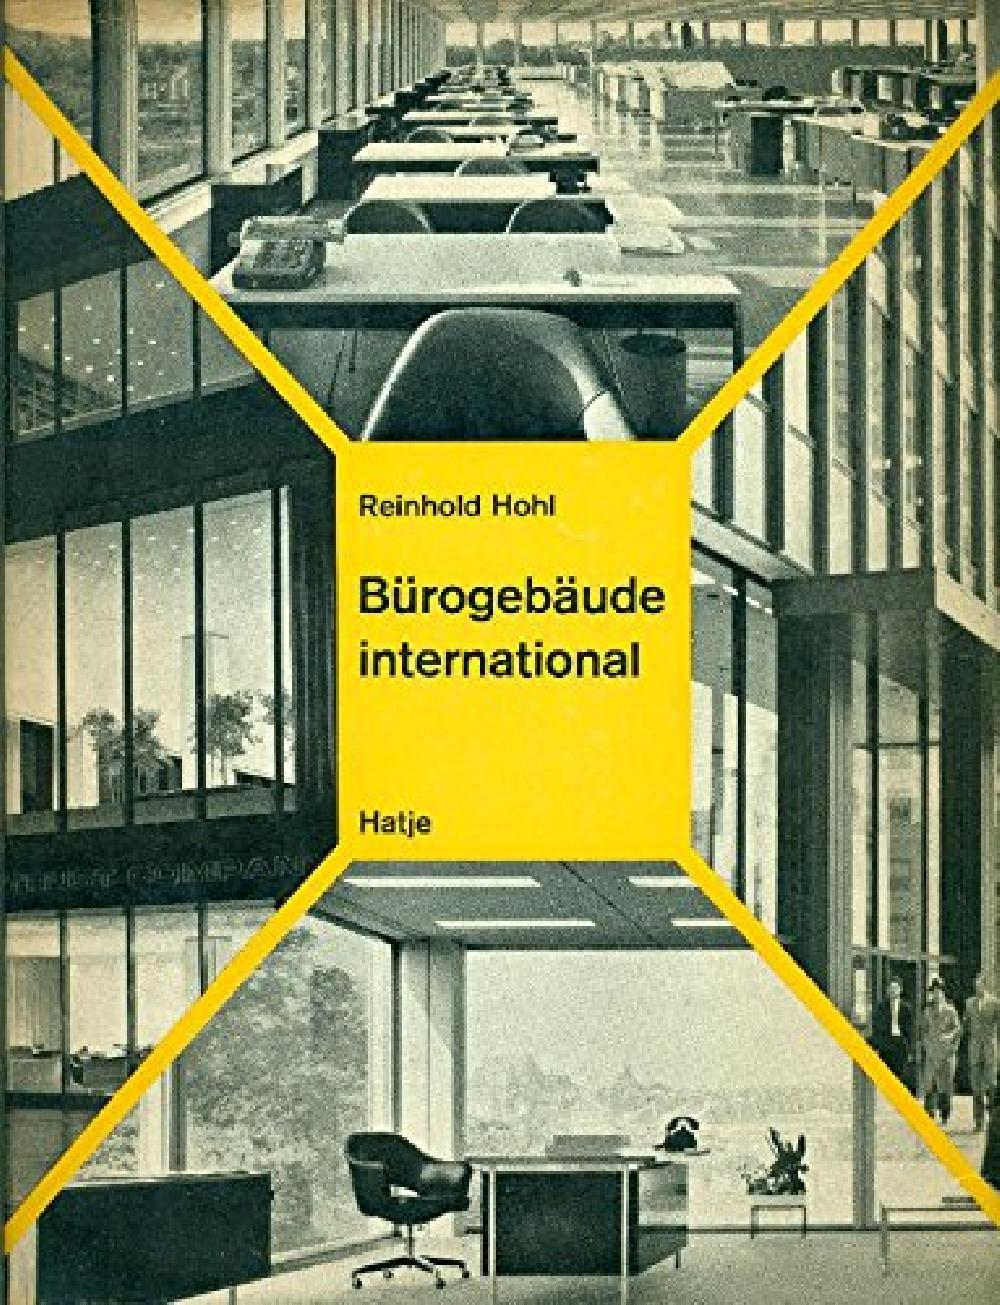 Bürogebäude international / International office building